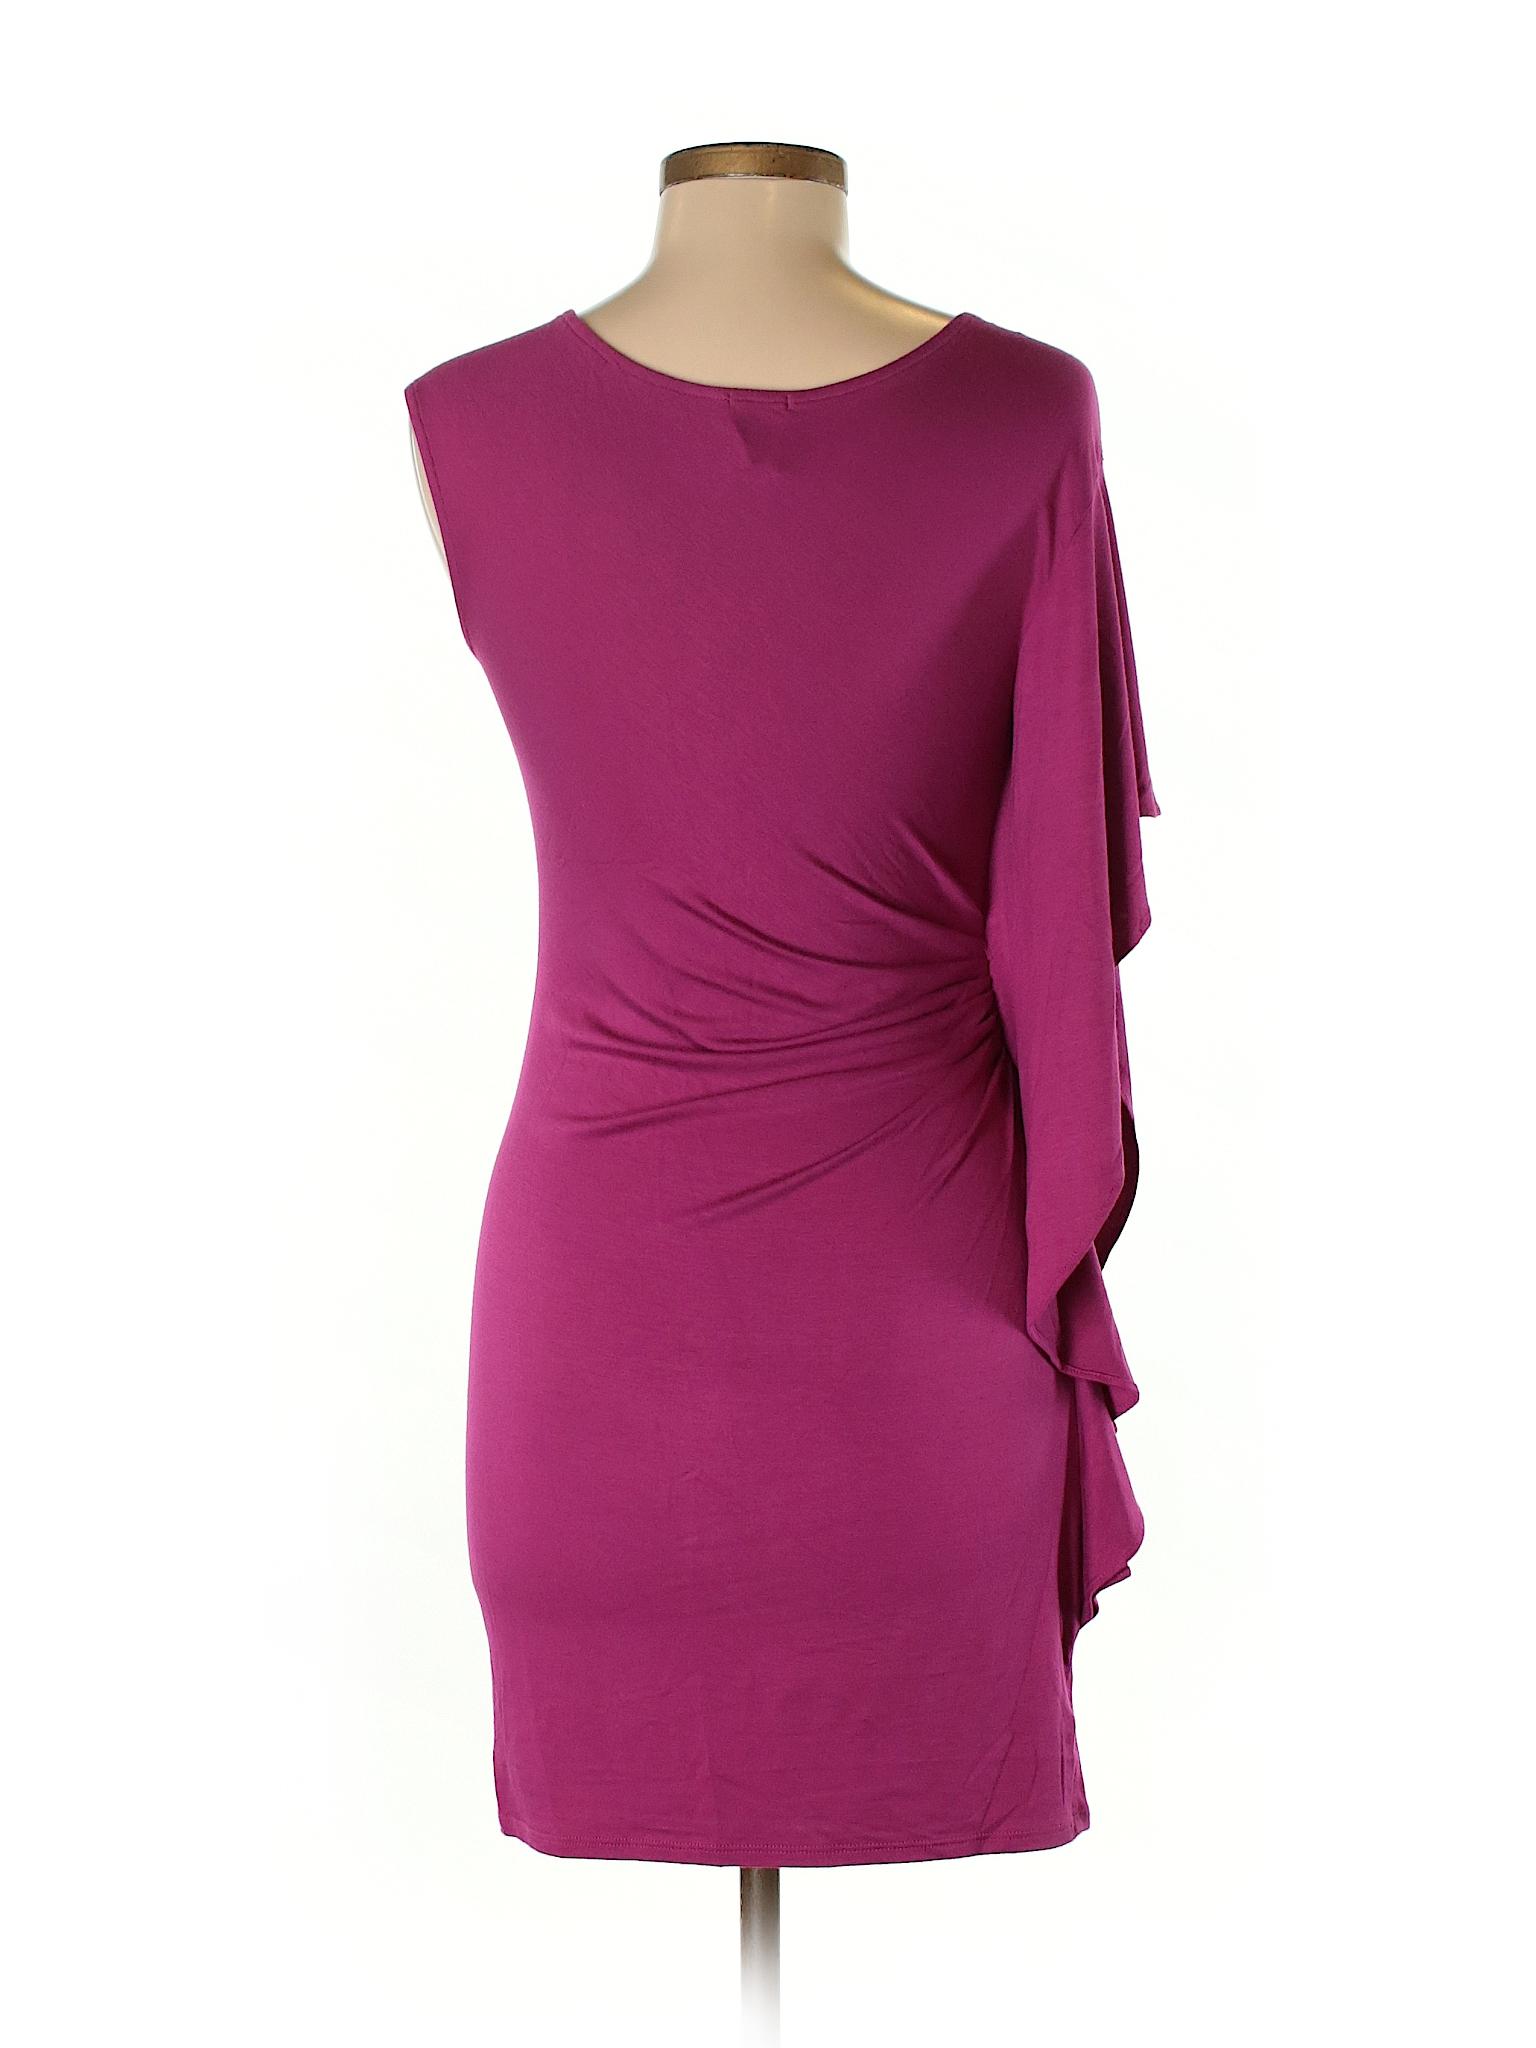 Ella Moss Boutique Dress winter Casual w0qA51a